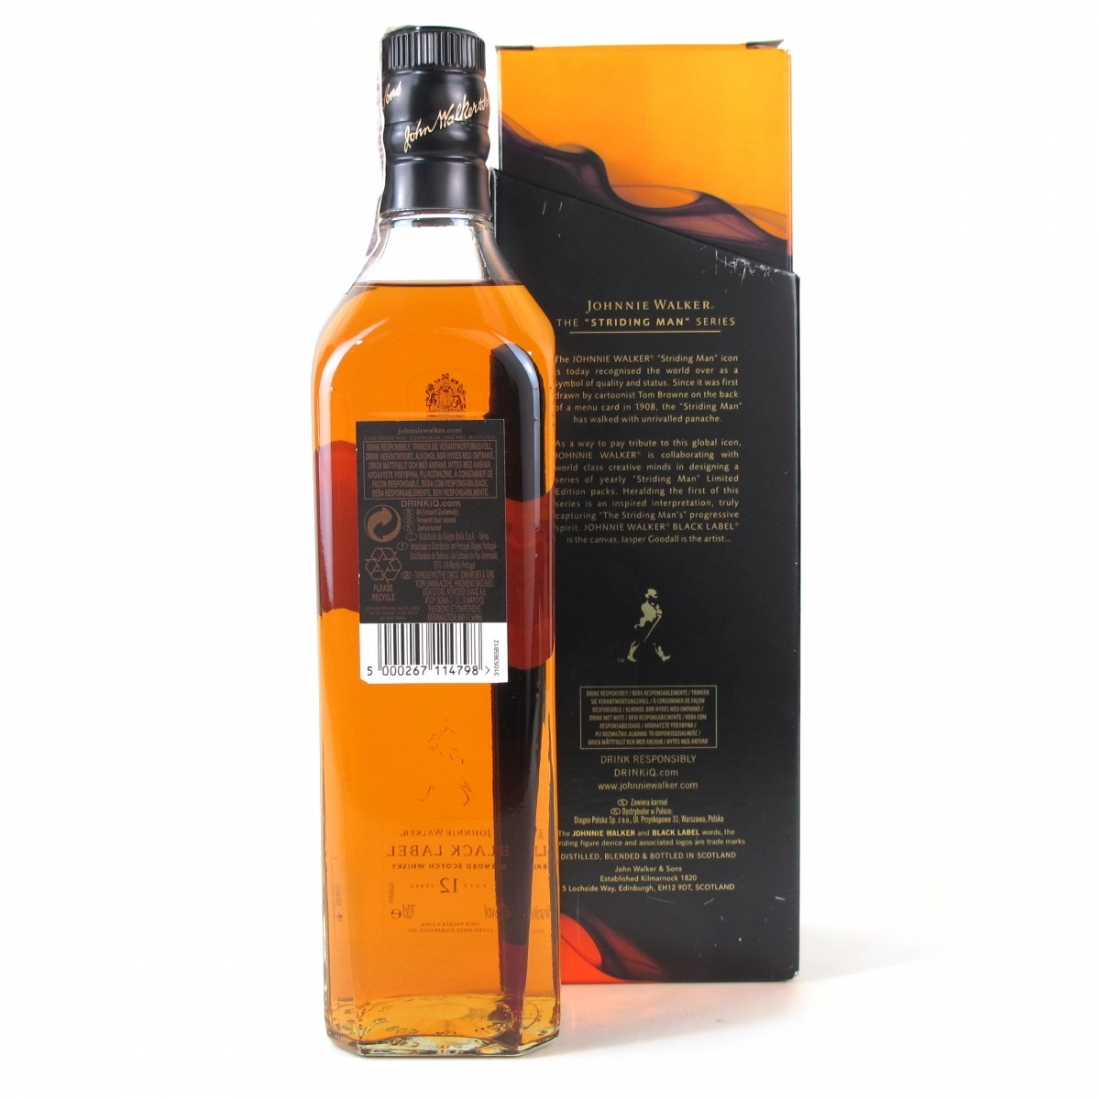 Johnnie Walker Black Label Jasper Goodall Limited Edition